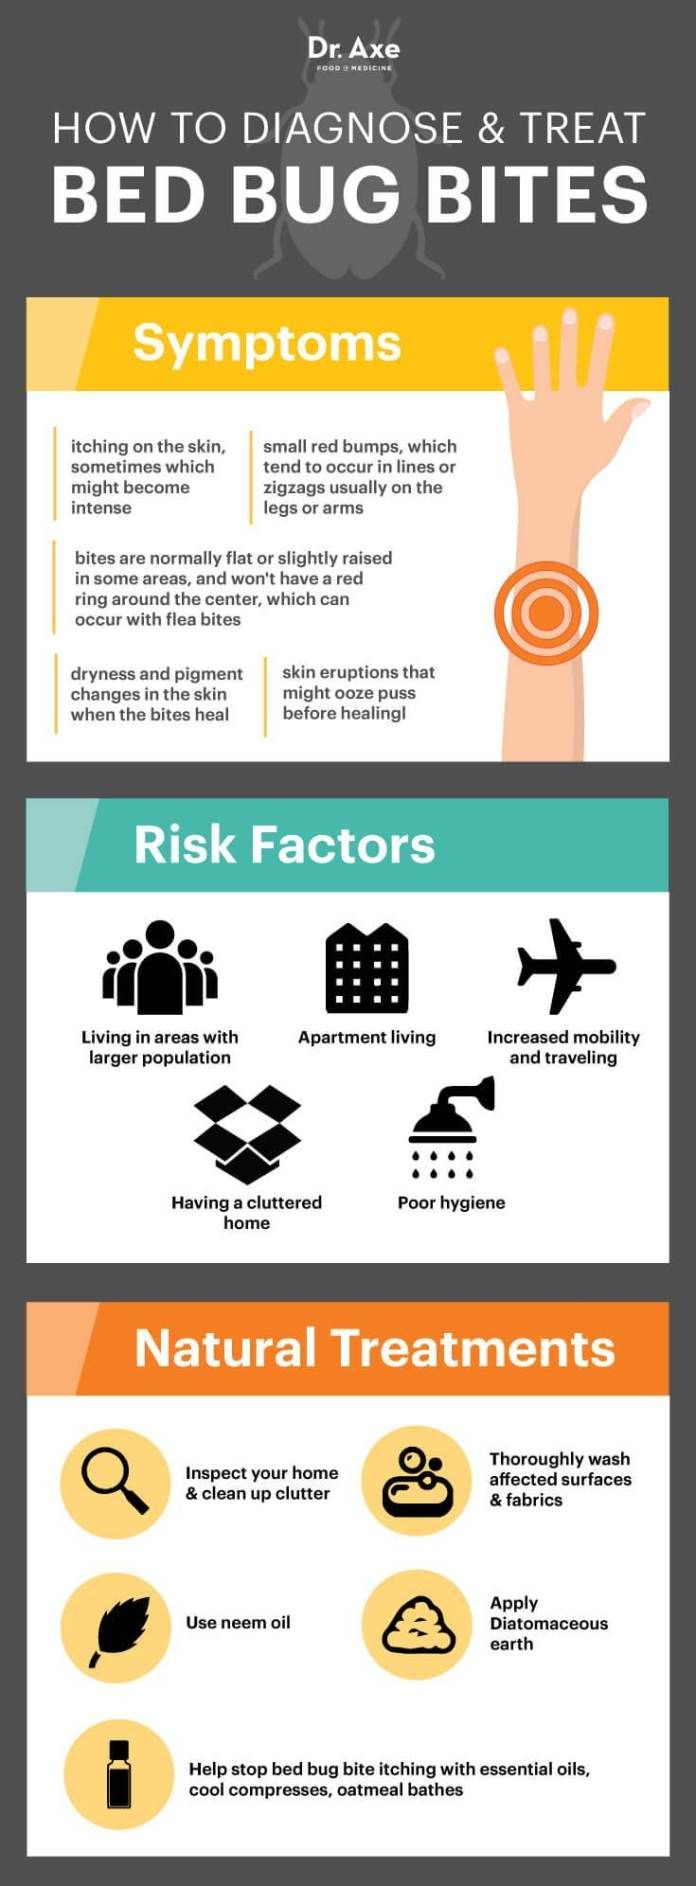 Bed Bug Bites Symptoms, Facts & Natural Treatments Bed